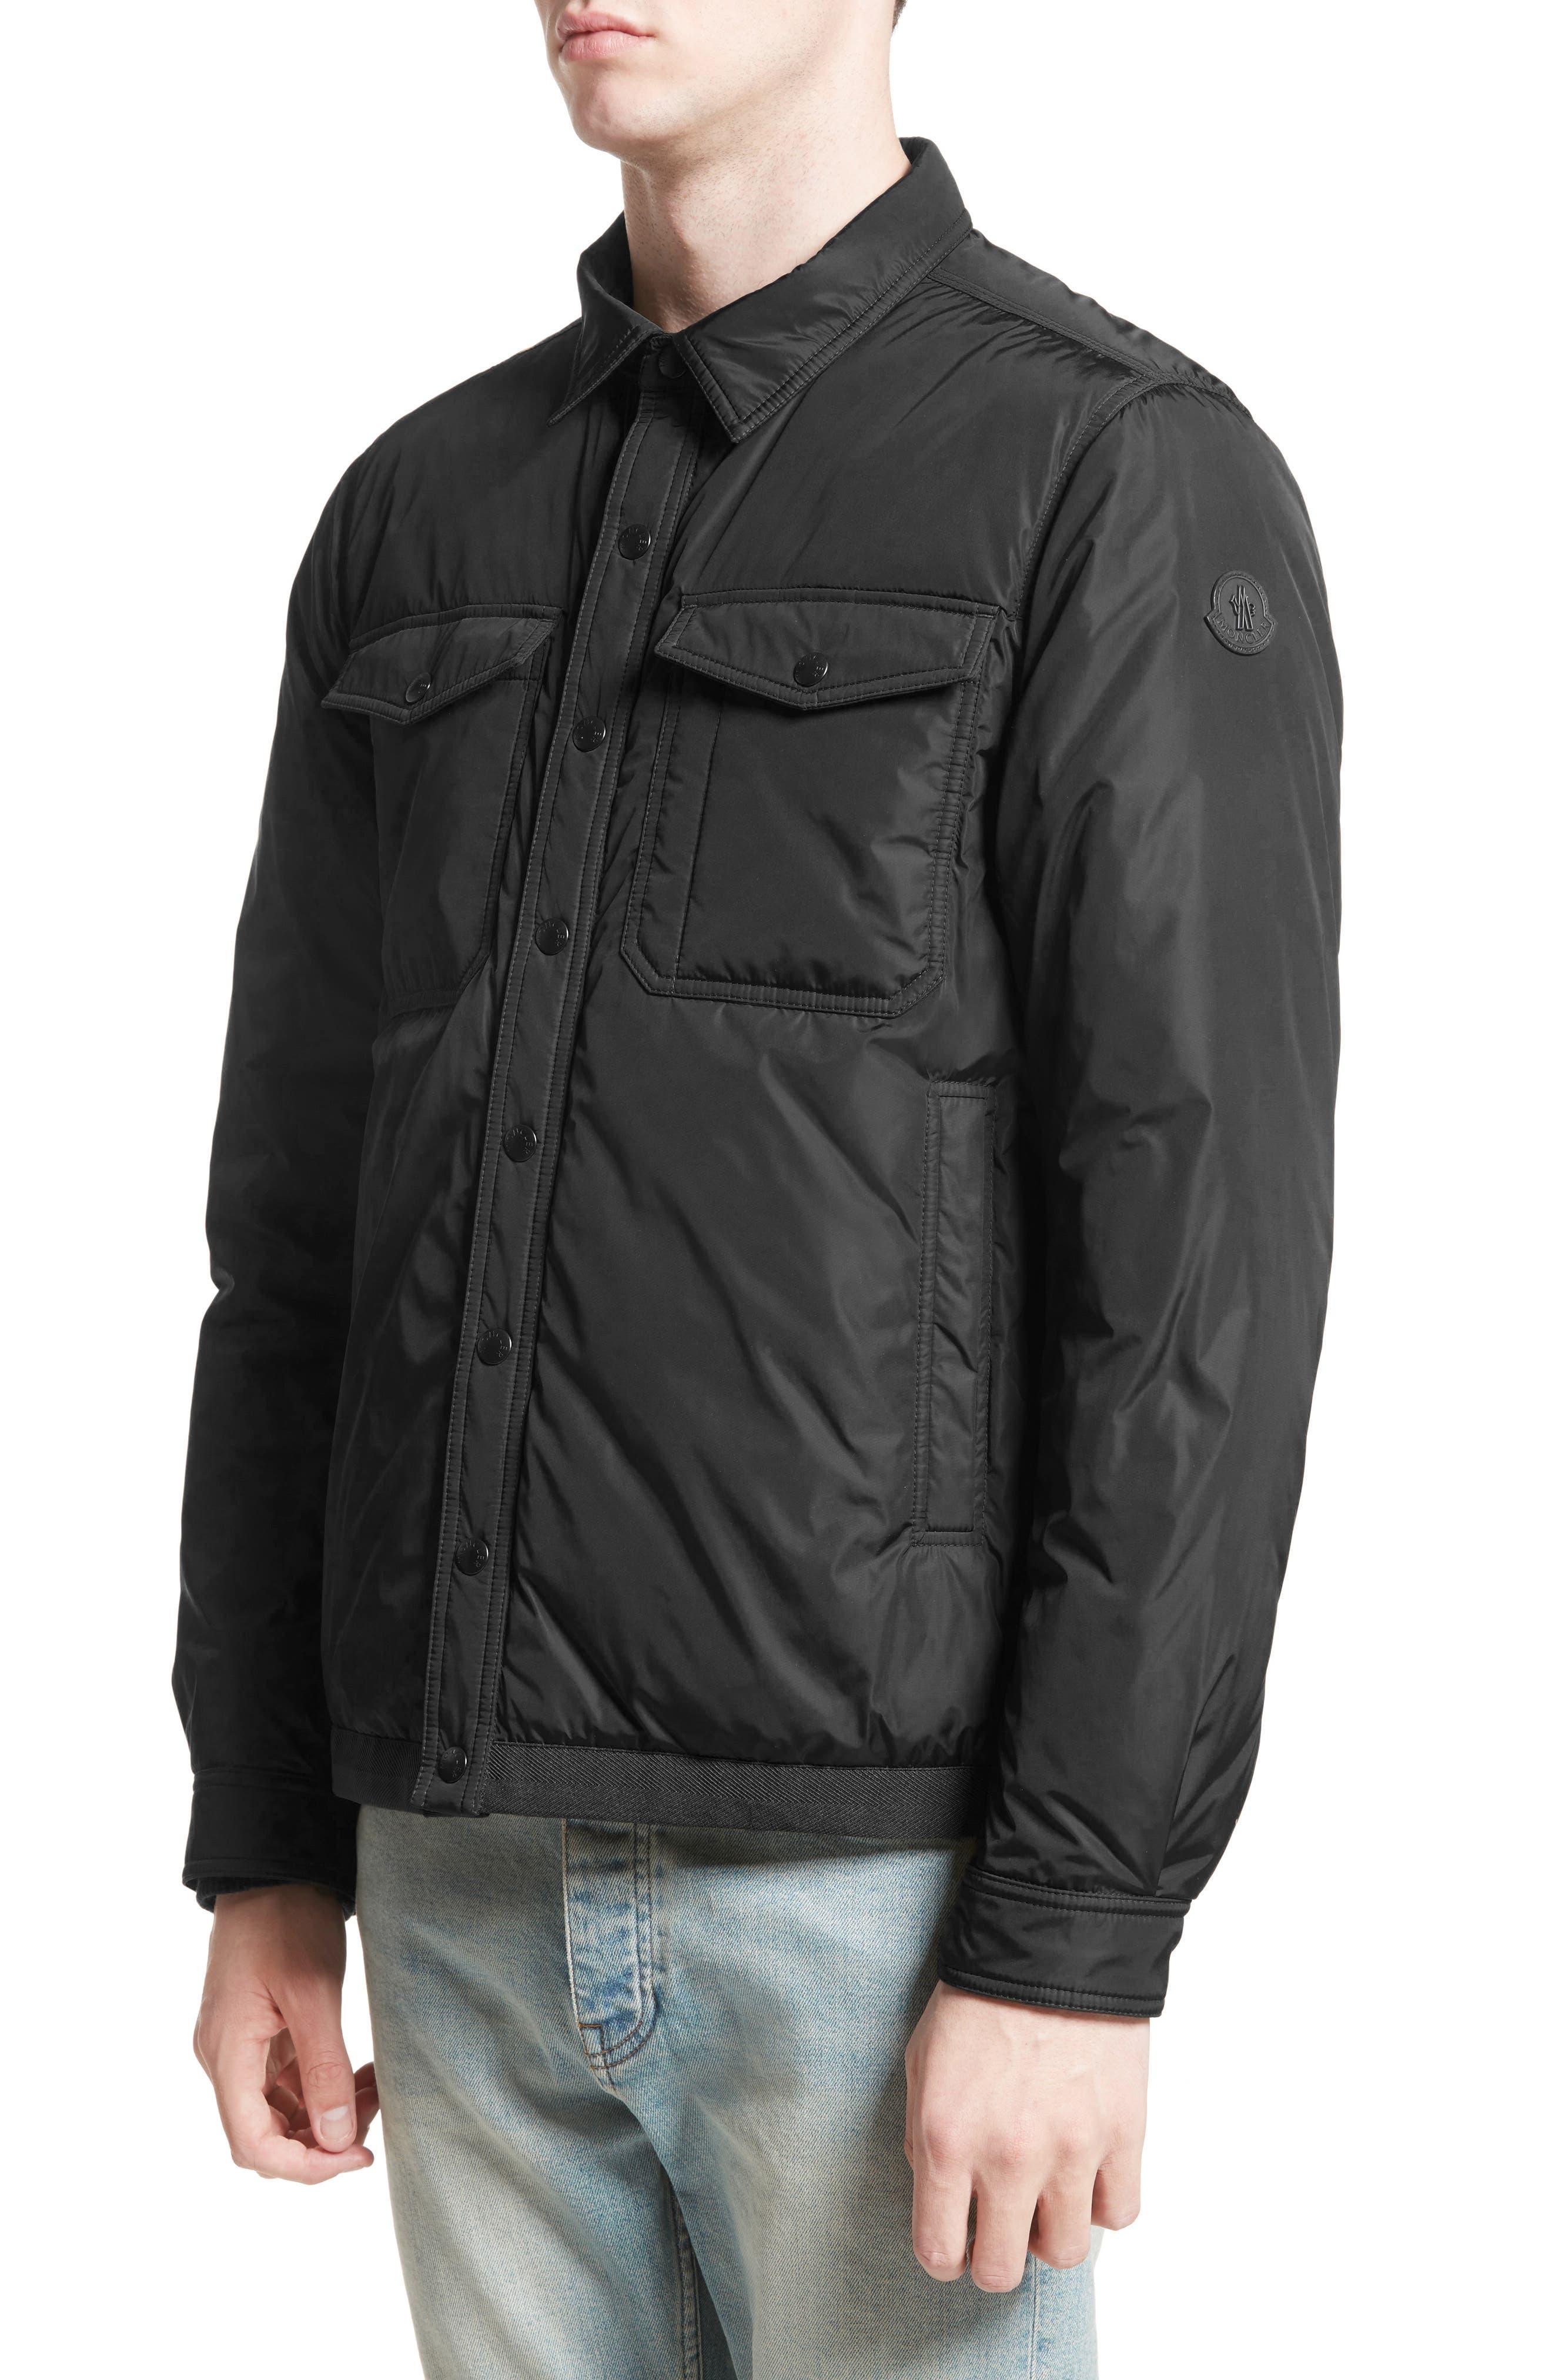 Erault Work Jacket,                         Main,                         color,